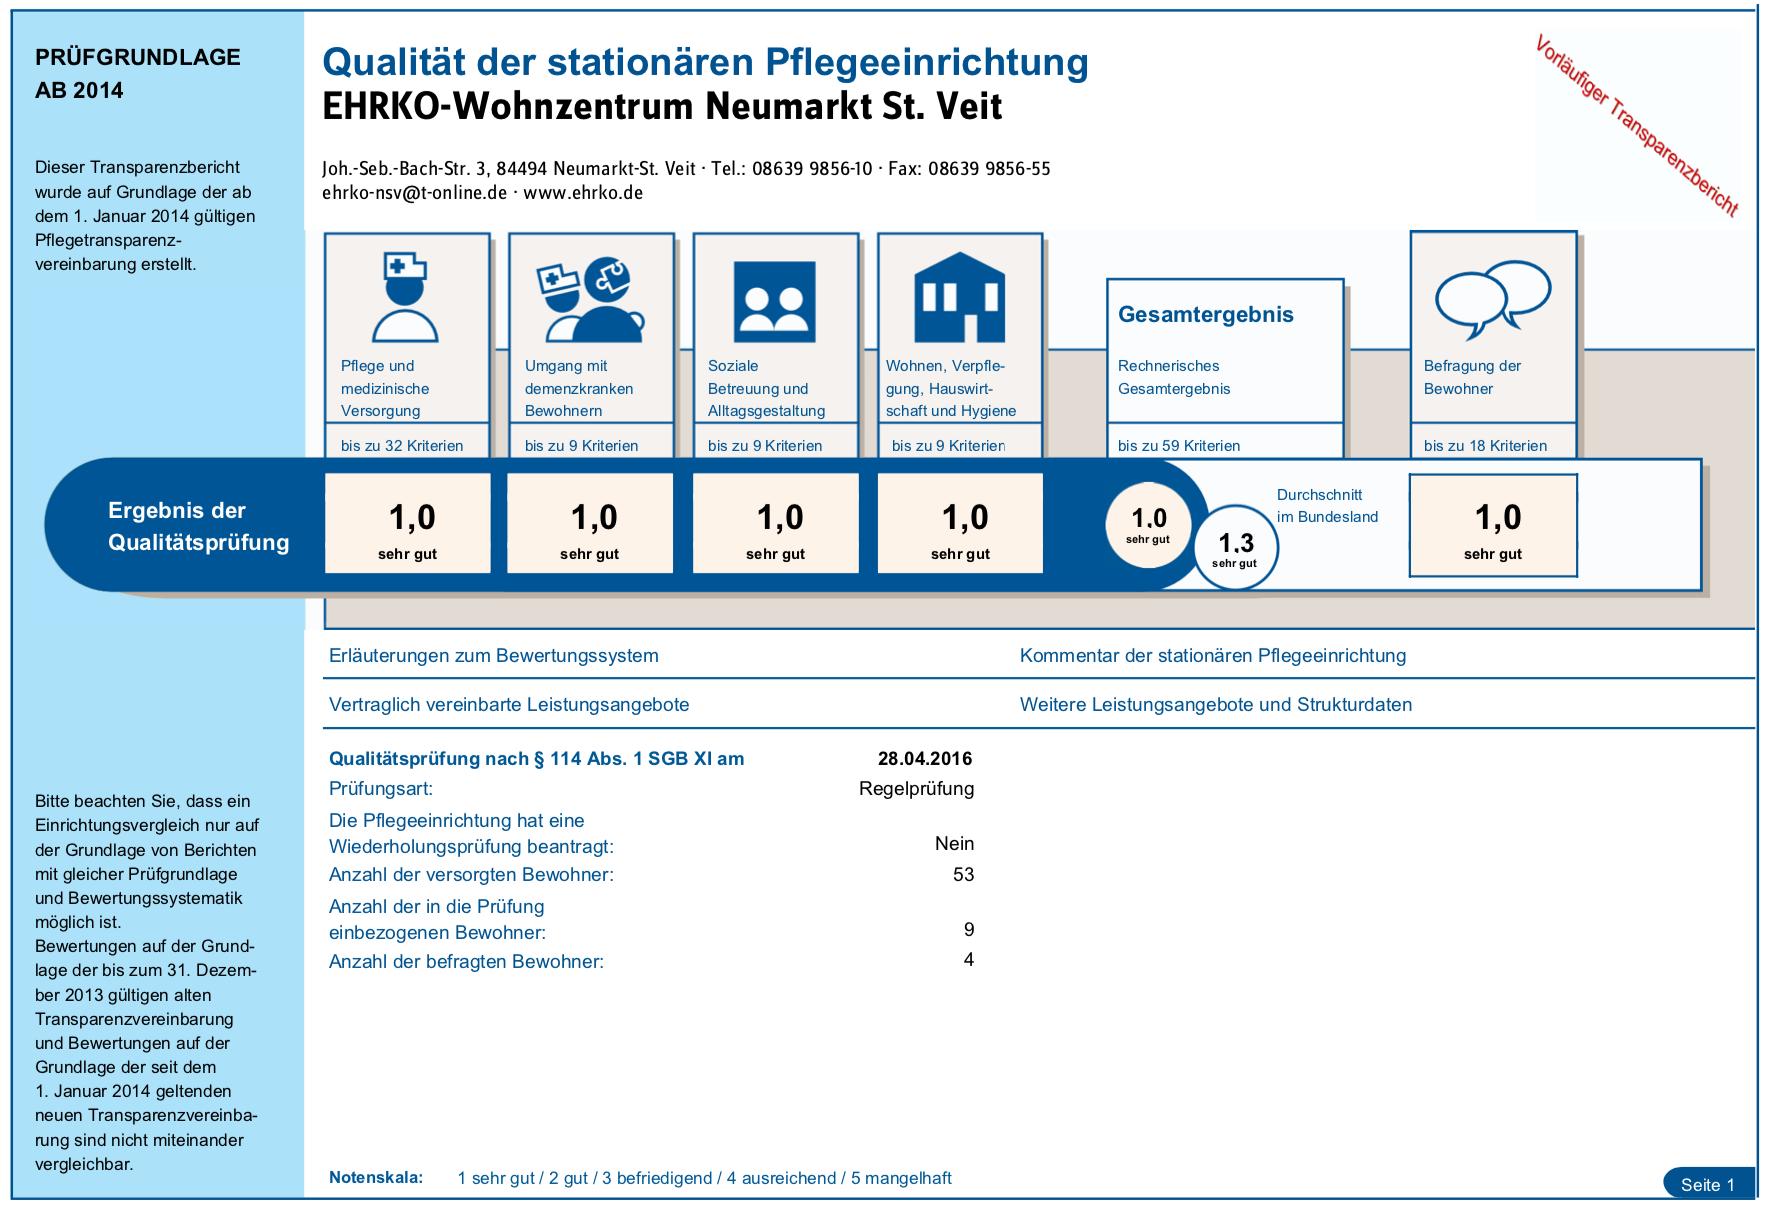 MDK Prüfbericht 2016-EHRKO.png